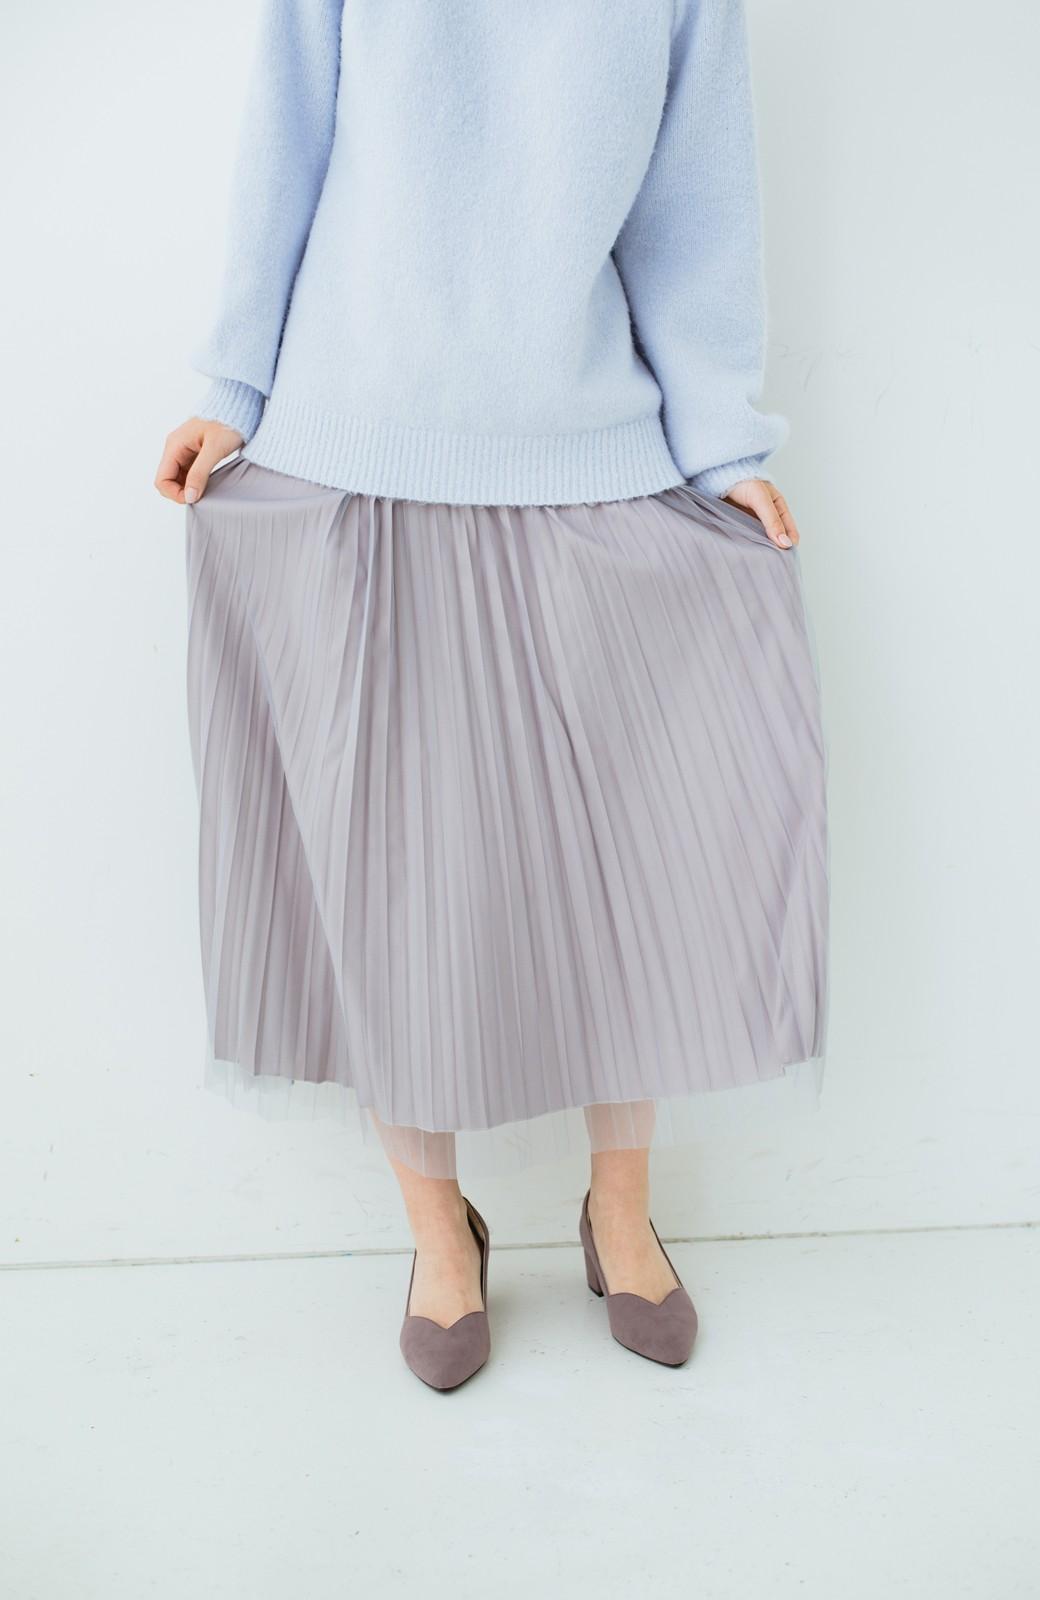 haco! どんな日も華やか気分にしてくれる 二枚仕立てのチュールプリーツスカート <ライトグレー>の商品写真7